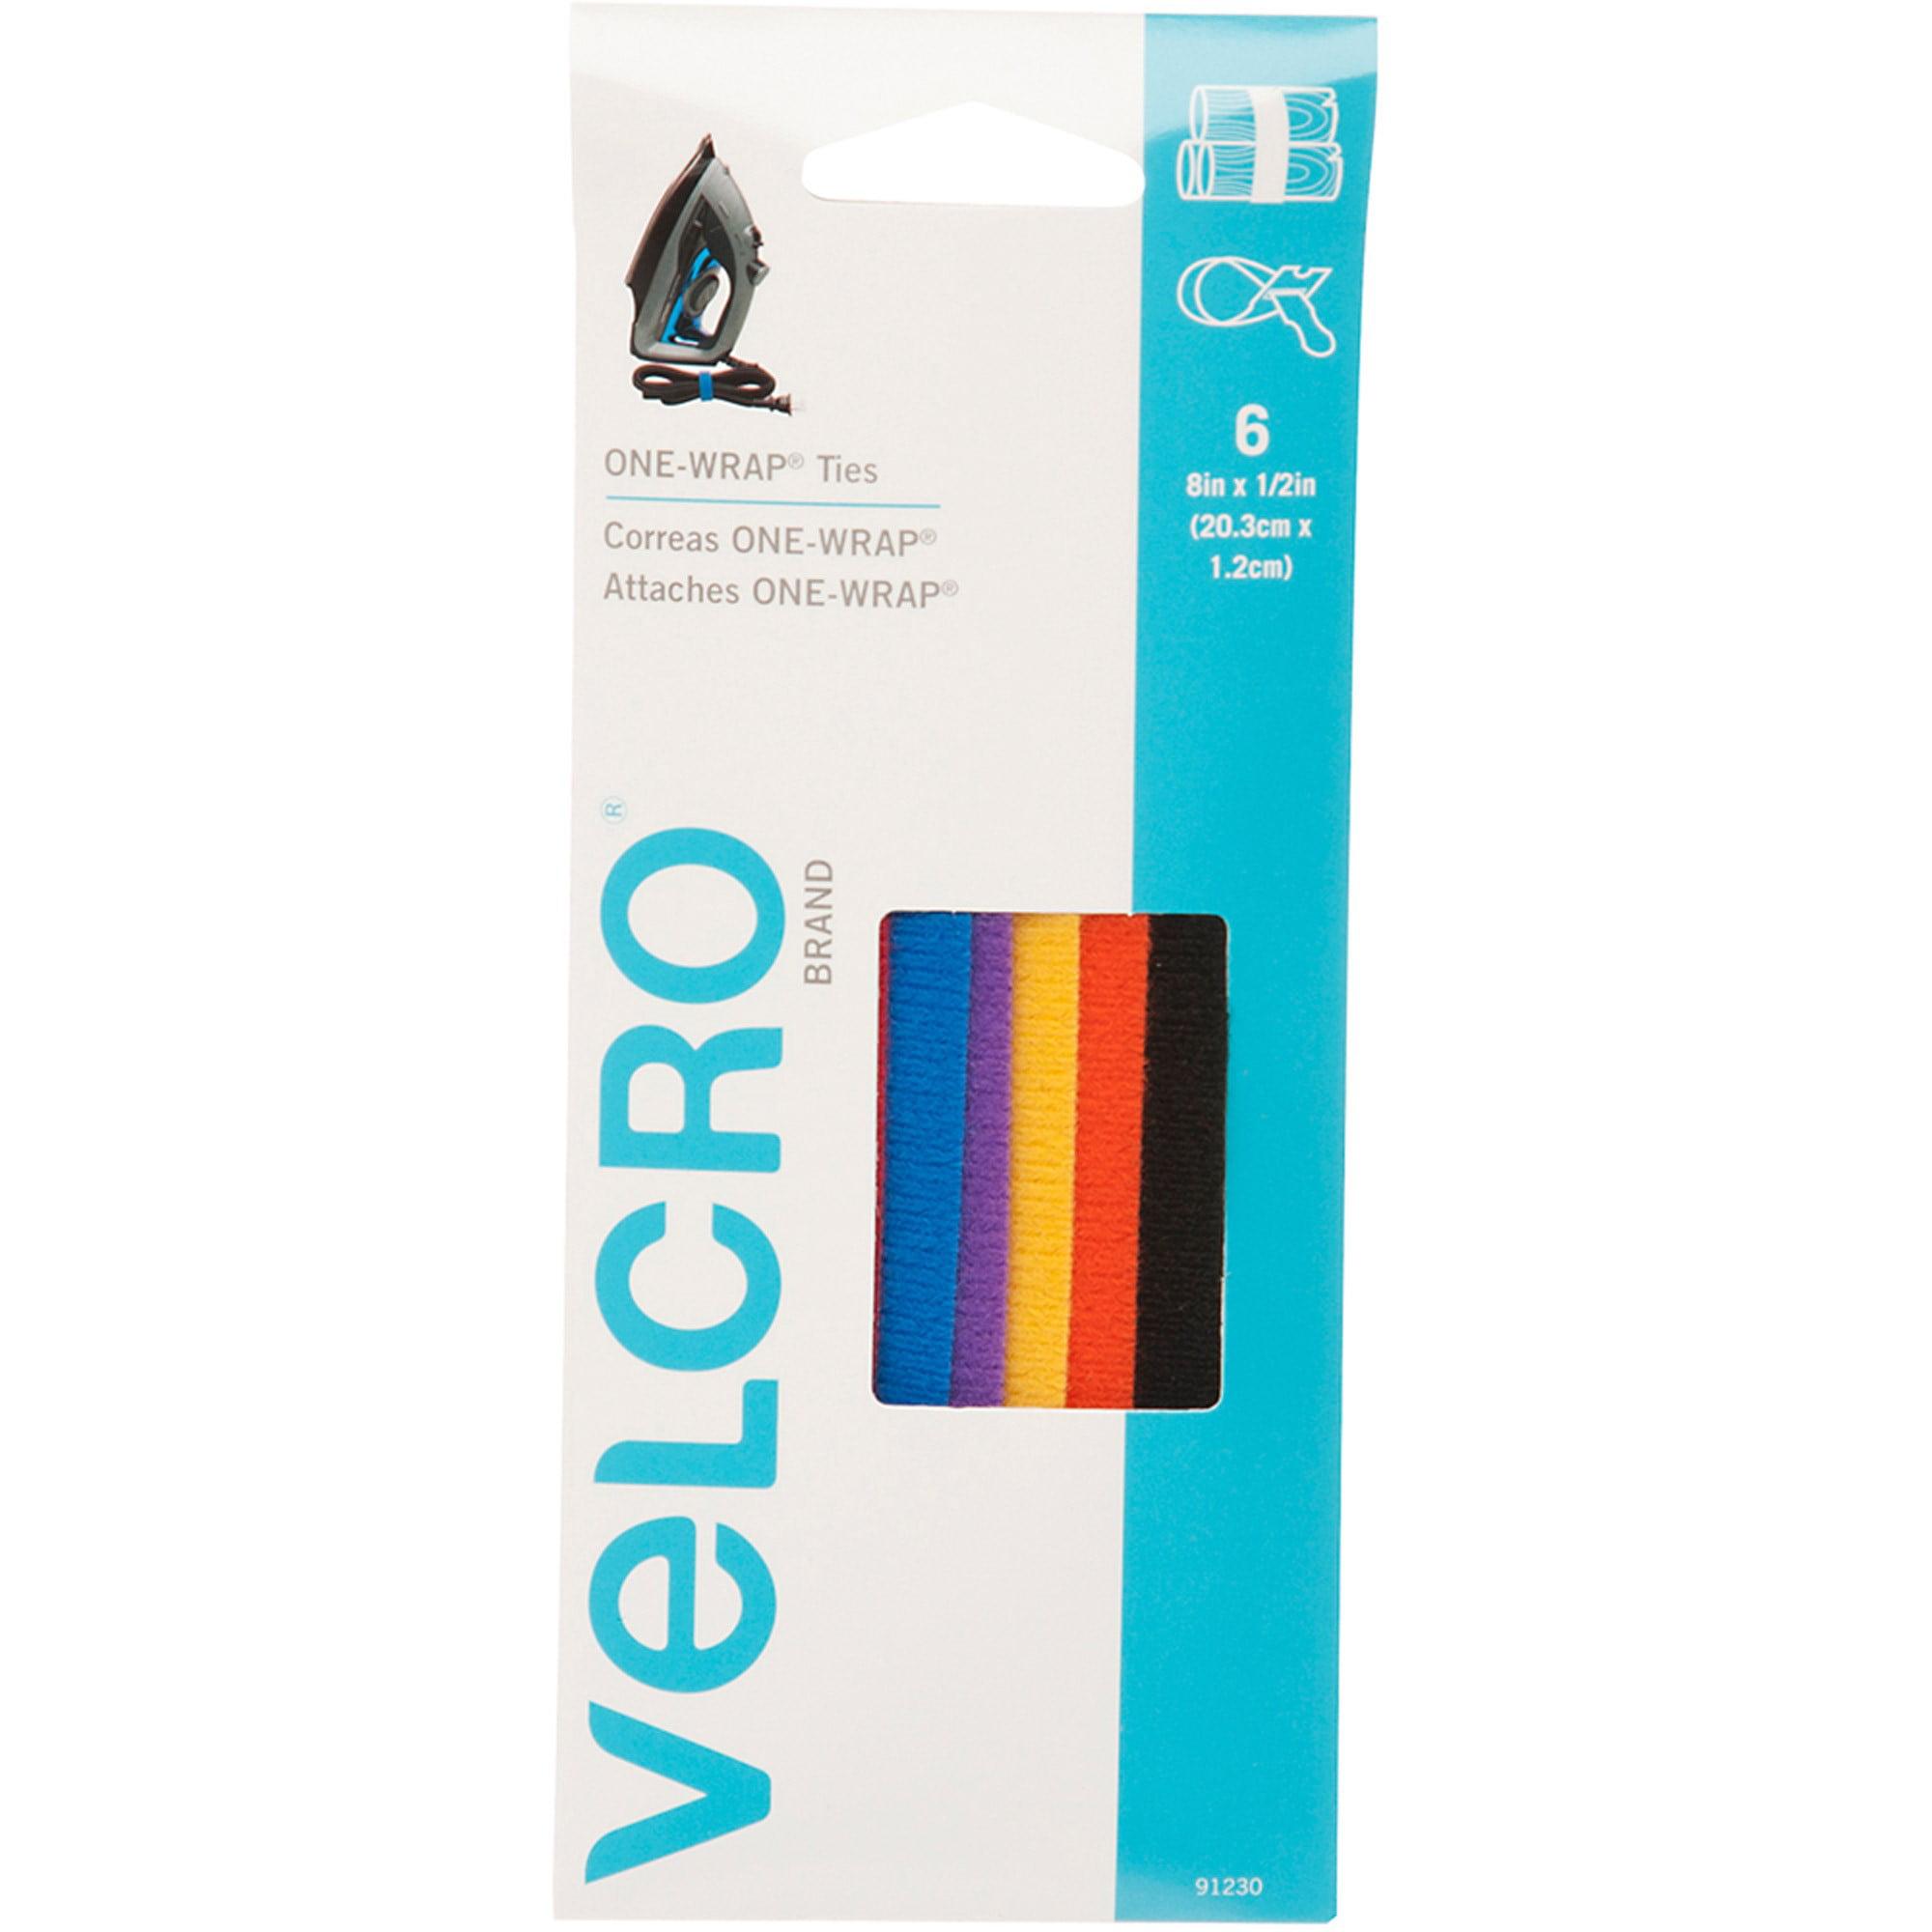 VELCRO® Brand ONE-WRAP® Ties 8in x 1/2in Ties, Multi-color - 6 ct ...